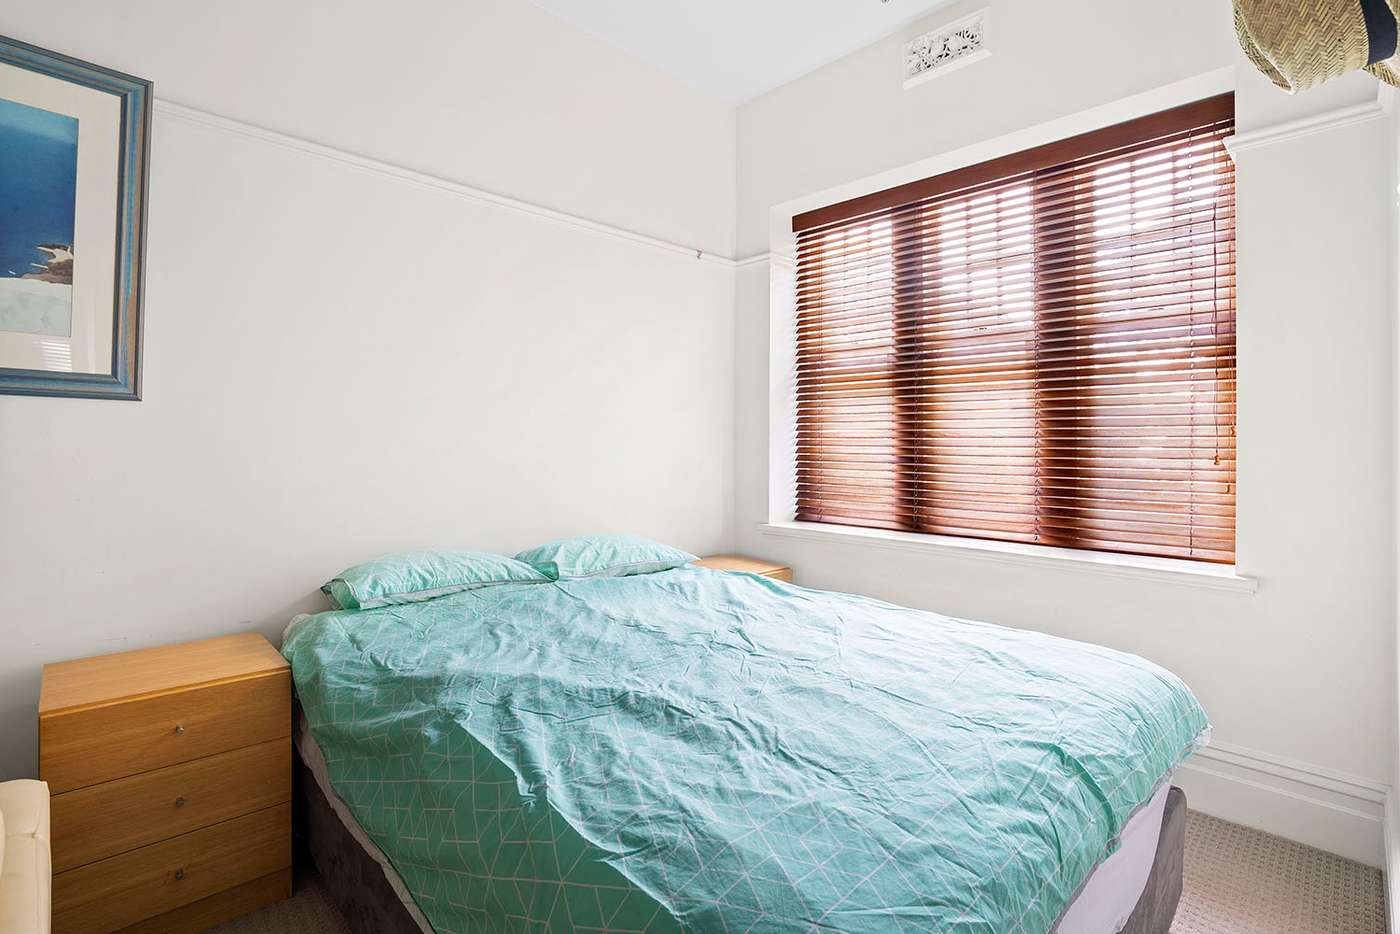 Seventh view of Homely studio listing, 4/2A Dalgety  Street, St Kilda VIC 3182